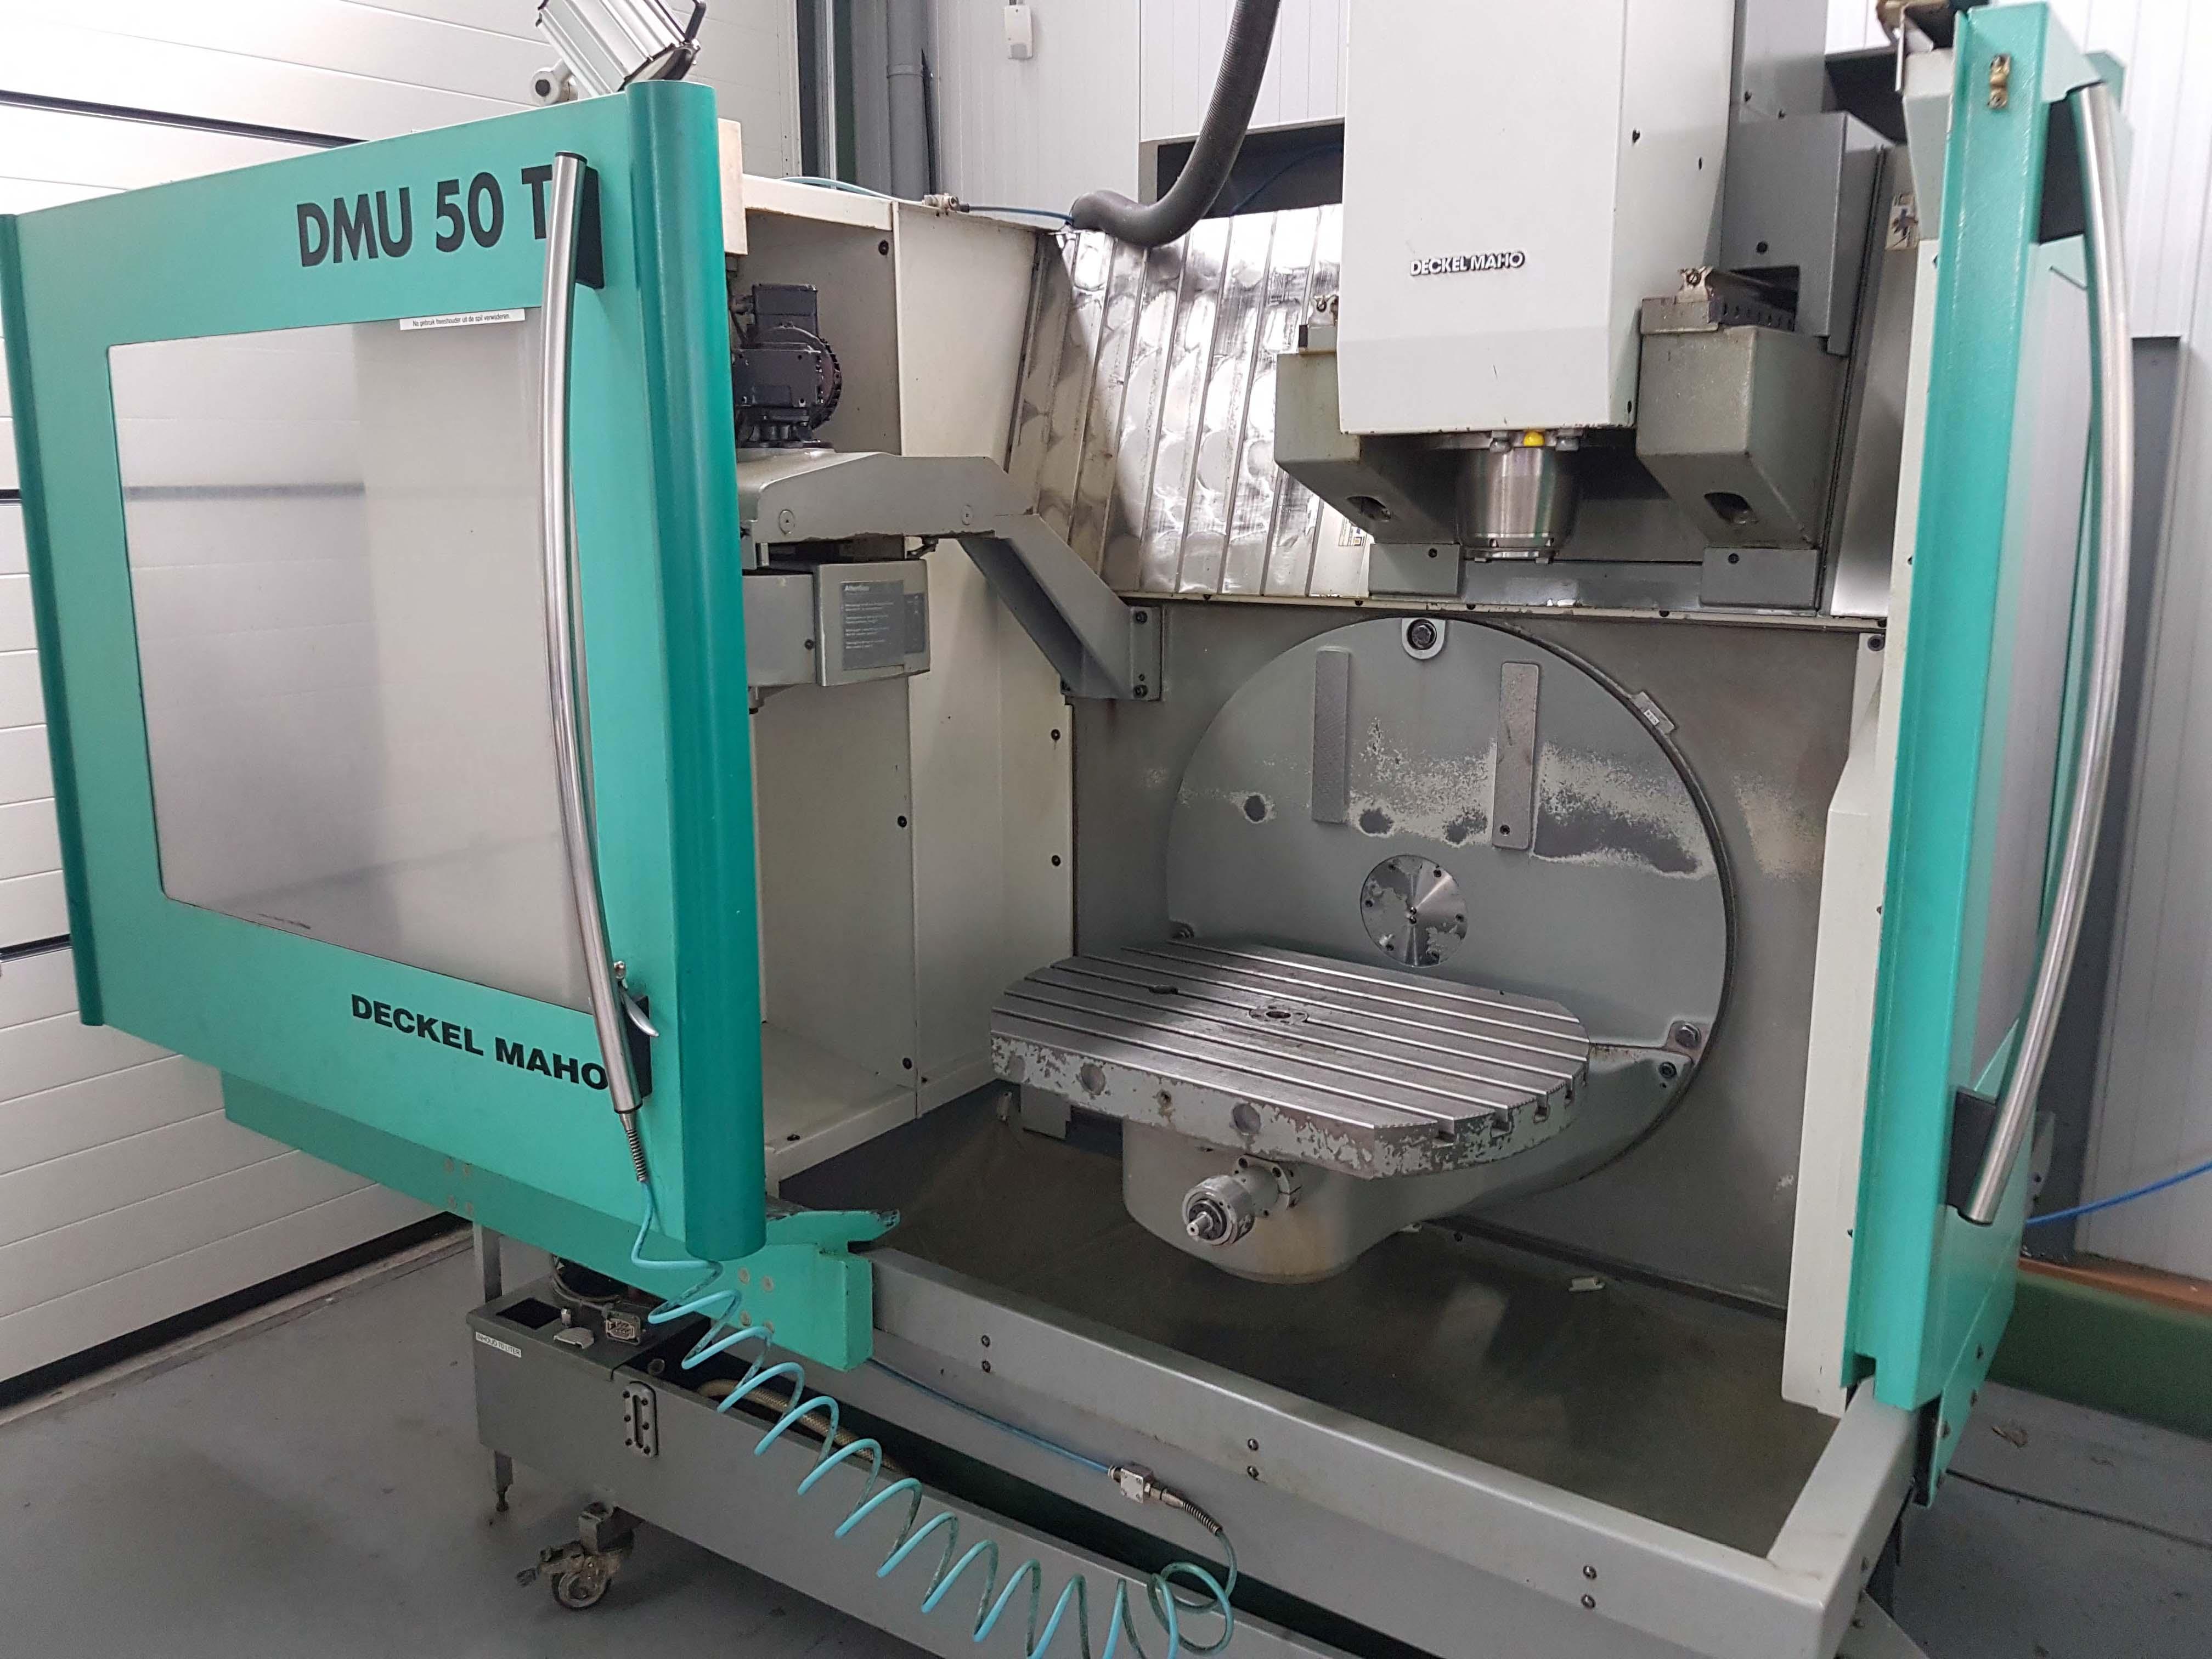 Deckel maho dmu 50 t cnc machining center exapro for Dmg deckel maho